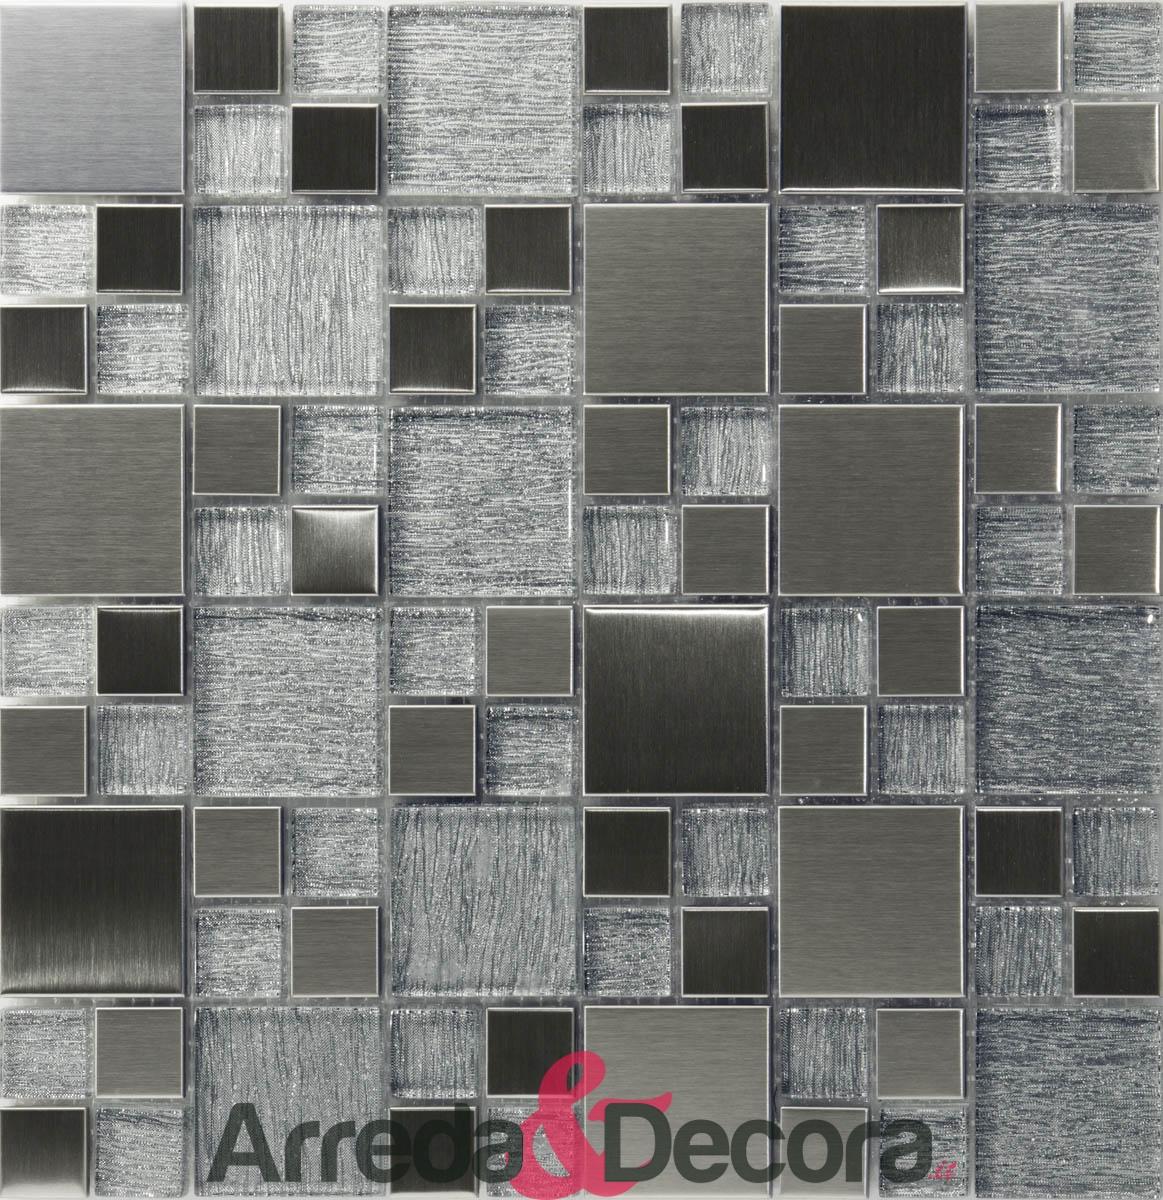 mosaico legno argento